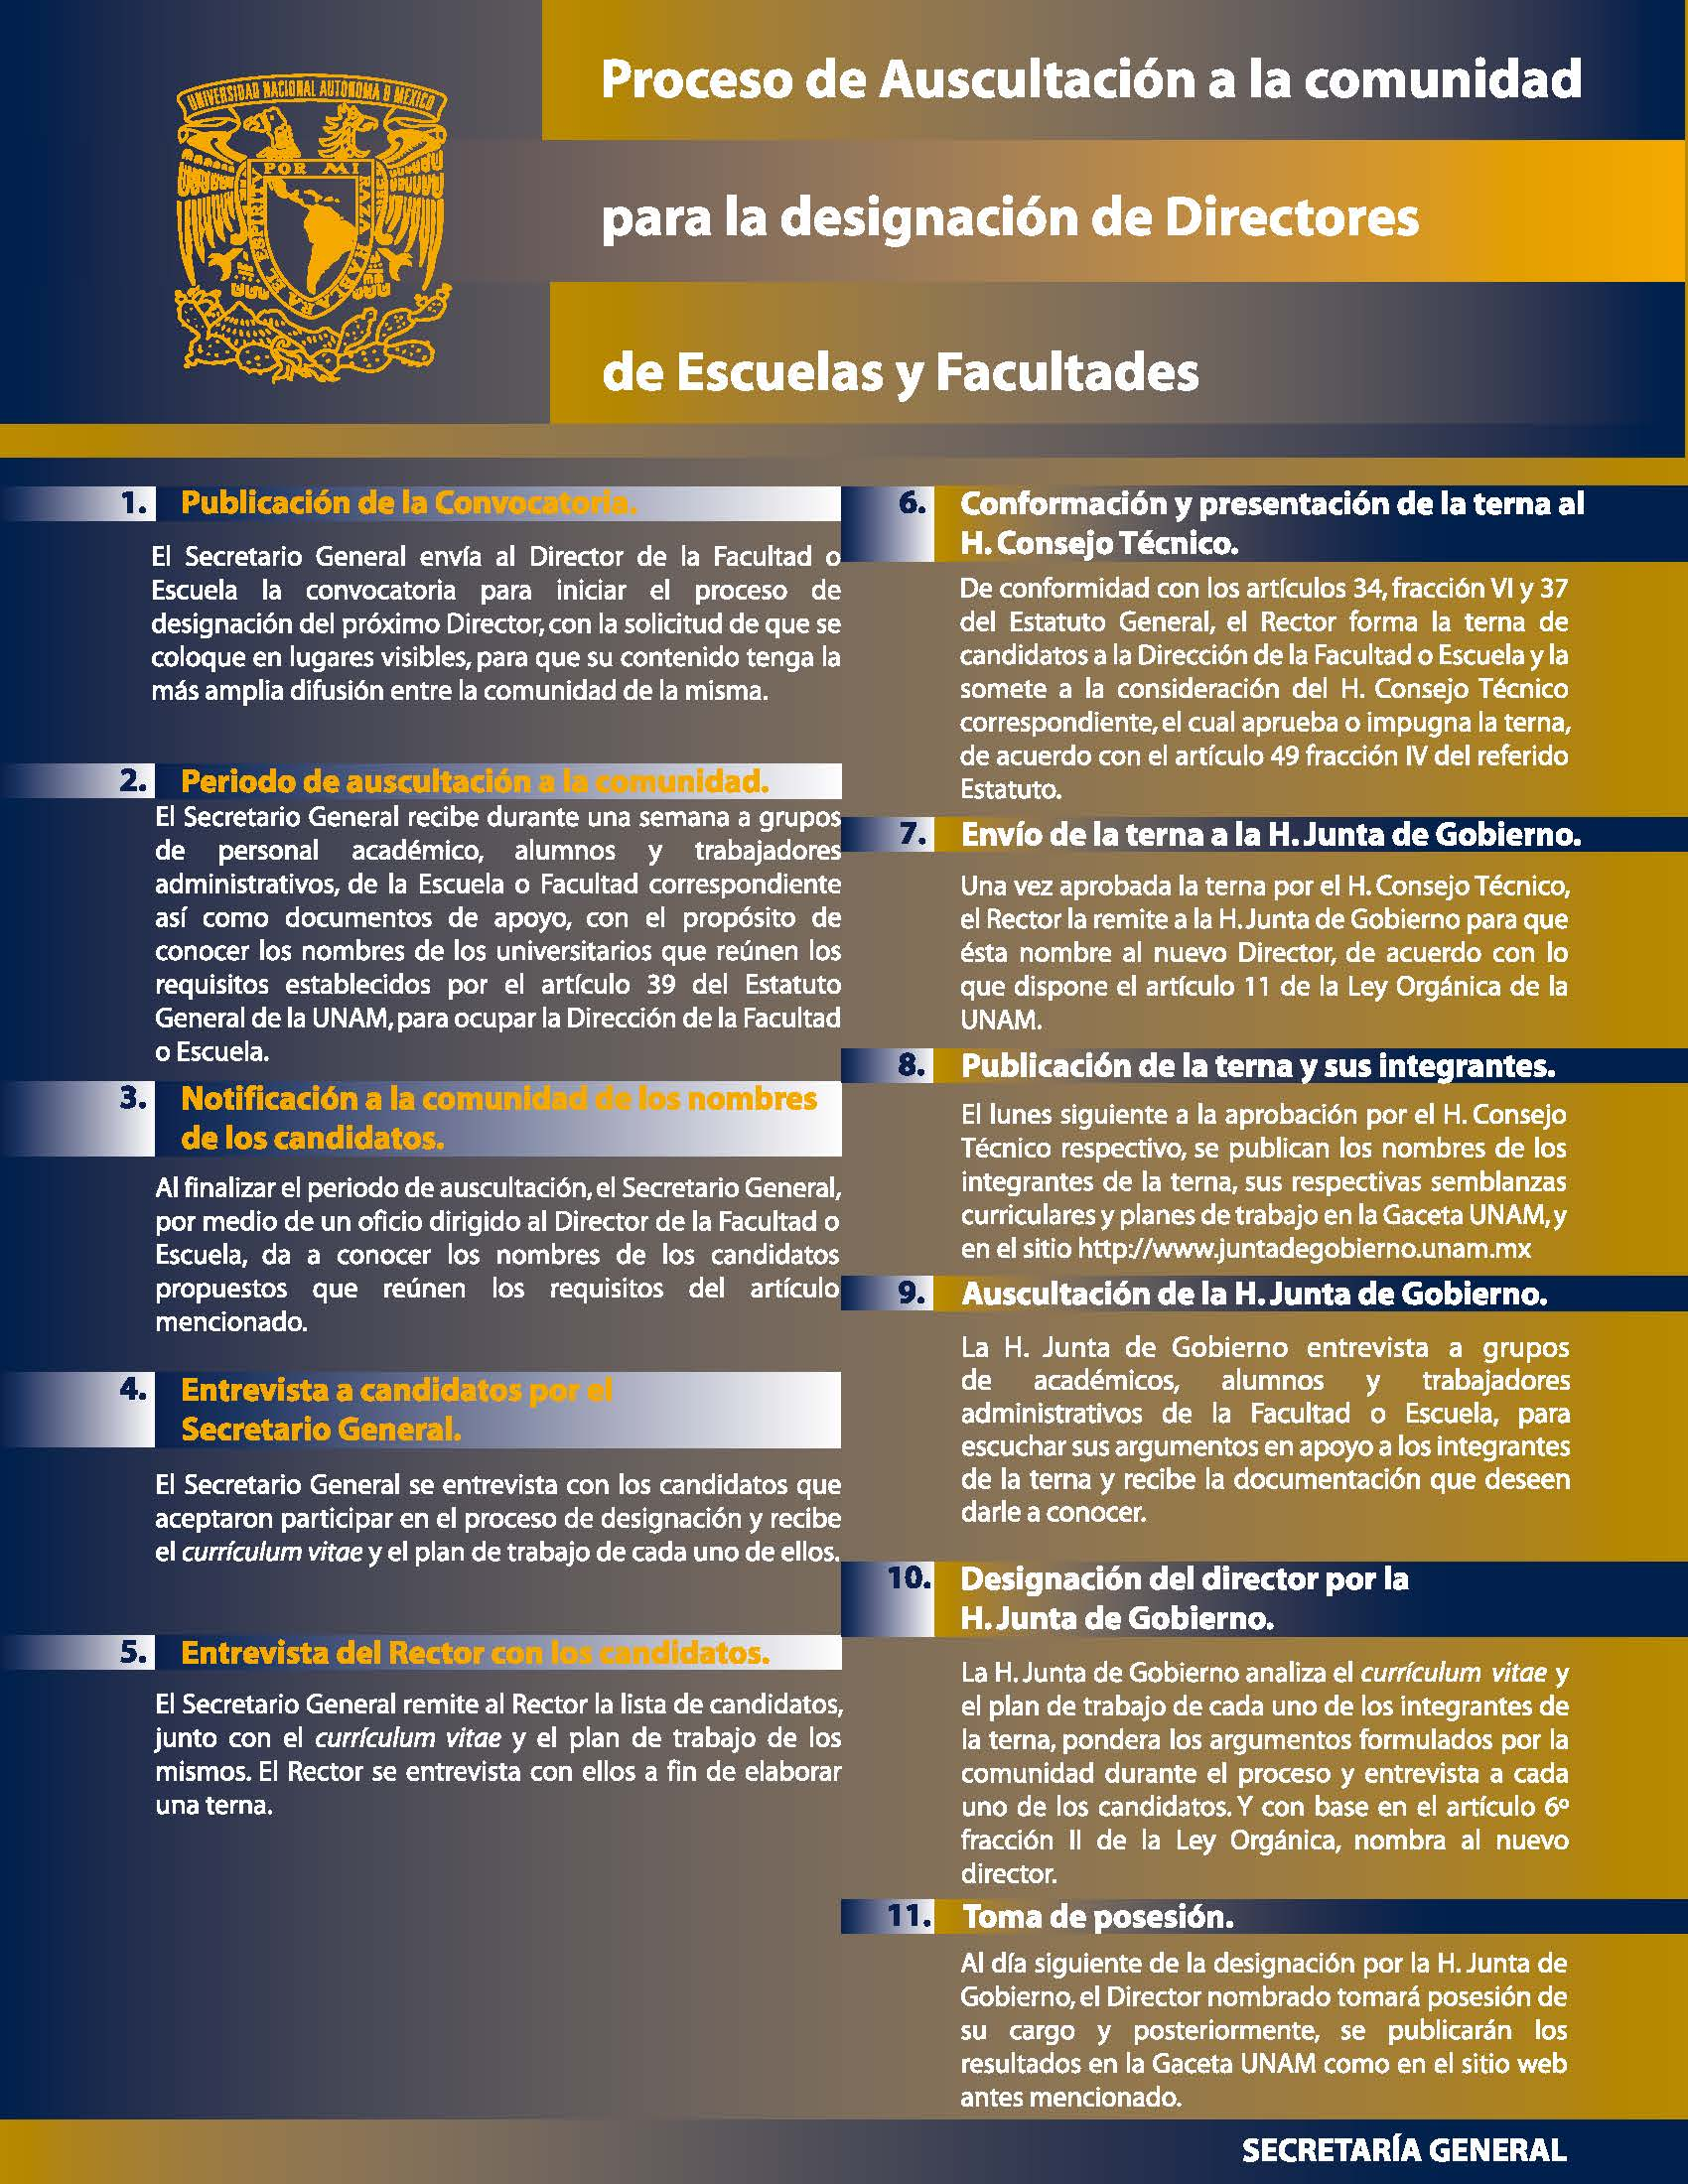 poster_auscultacion_carta